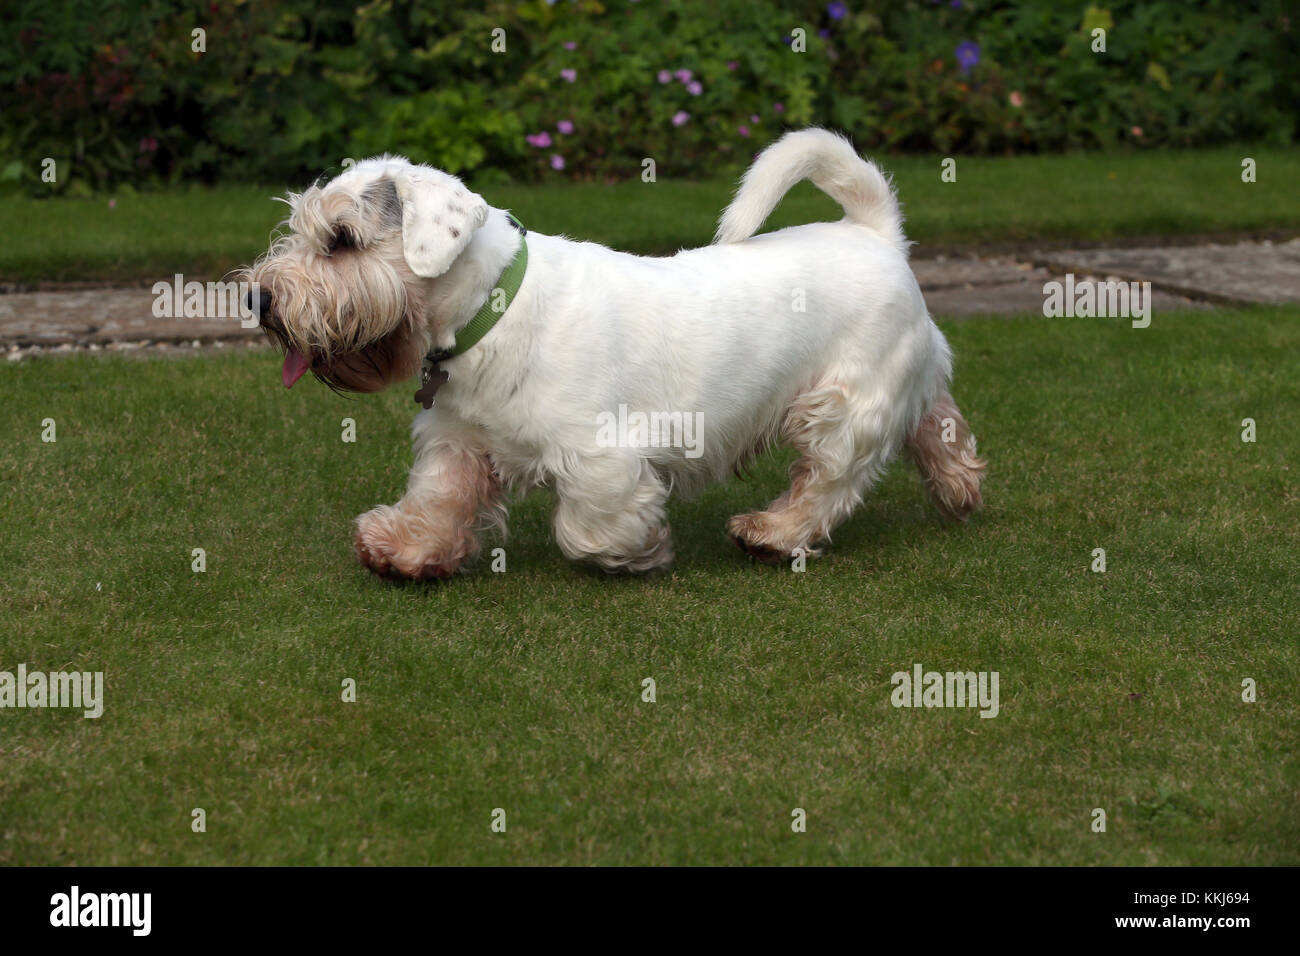 - Sealyham Terrier Sealyham Terrier Trab Stockbild